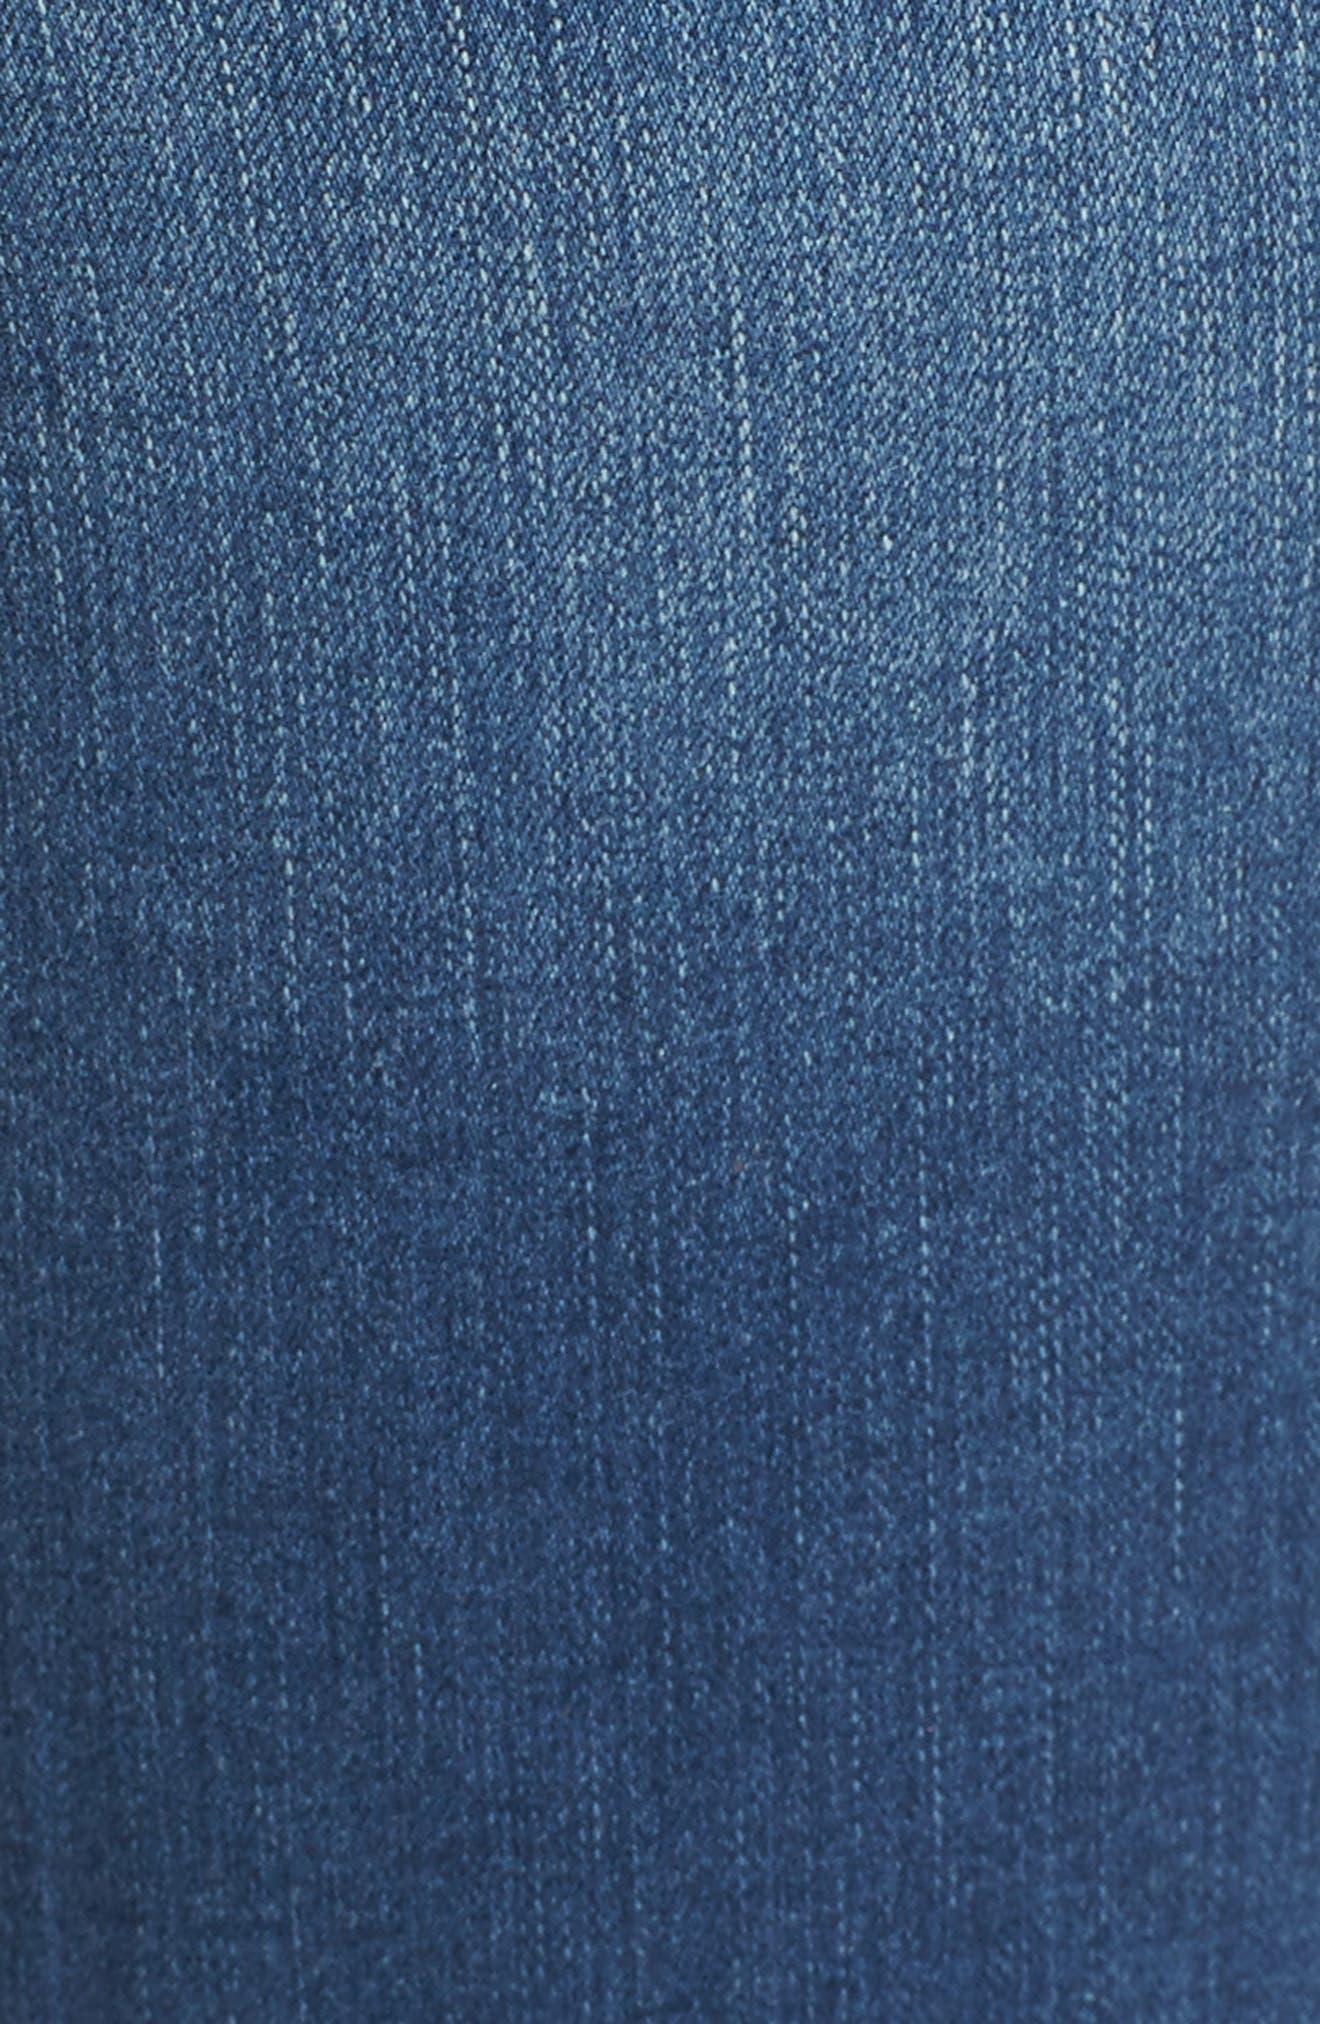 JAG JEANS, Peri Pull-On Straight Leg Jeans, Alternate thumbnail 5, color, MEDIUM INDIGO